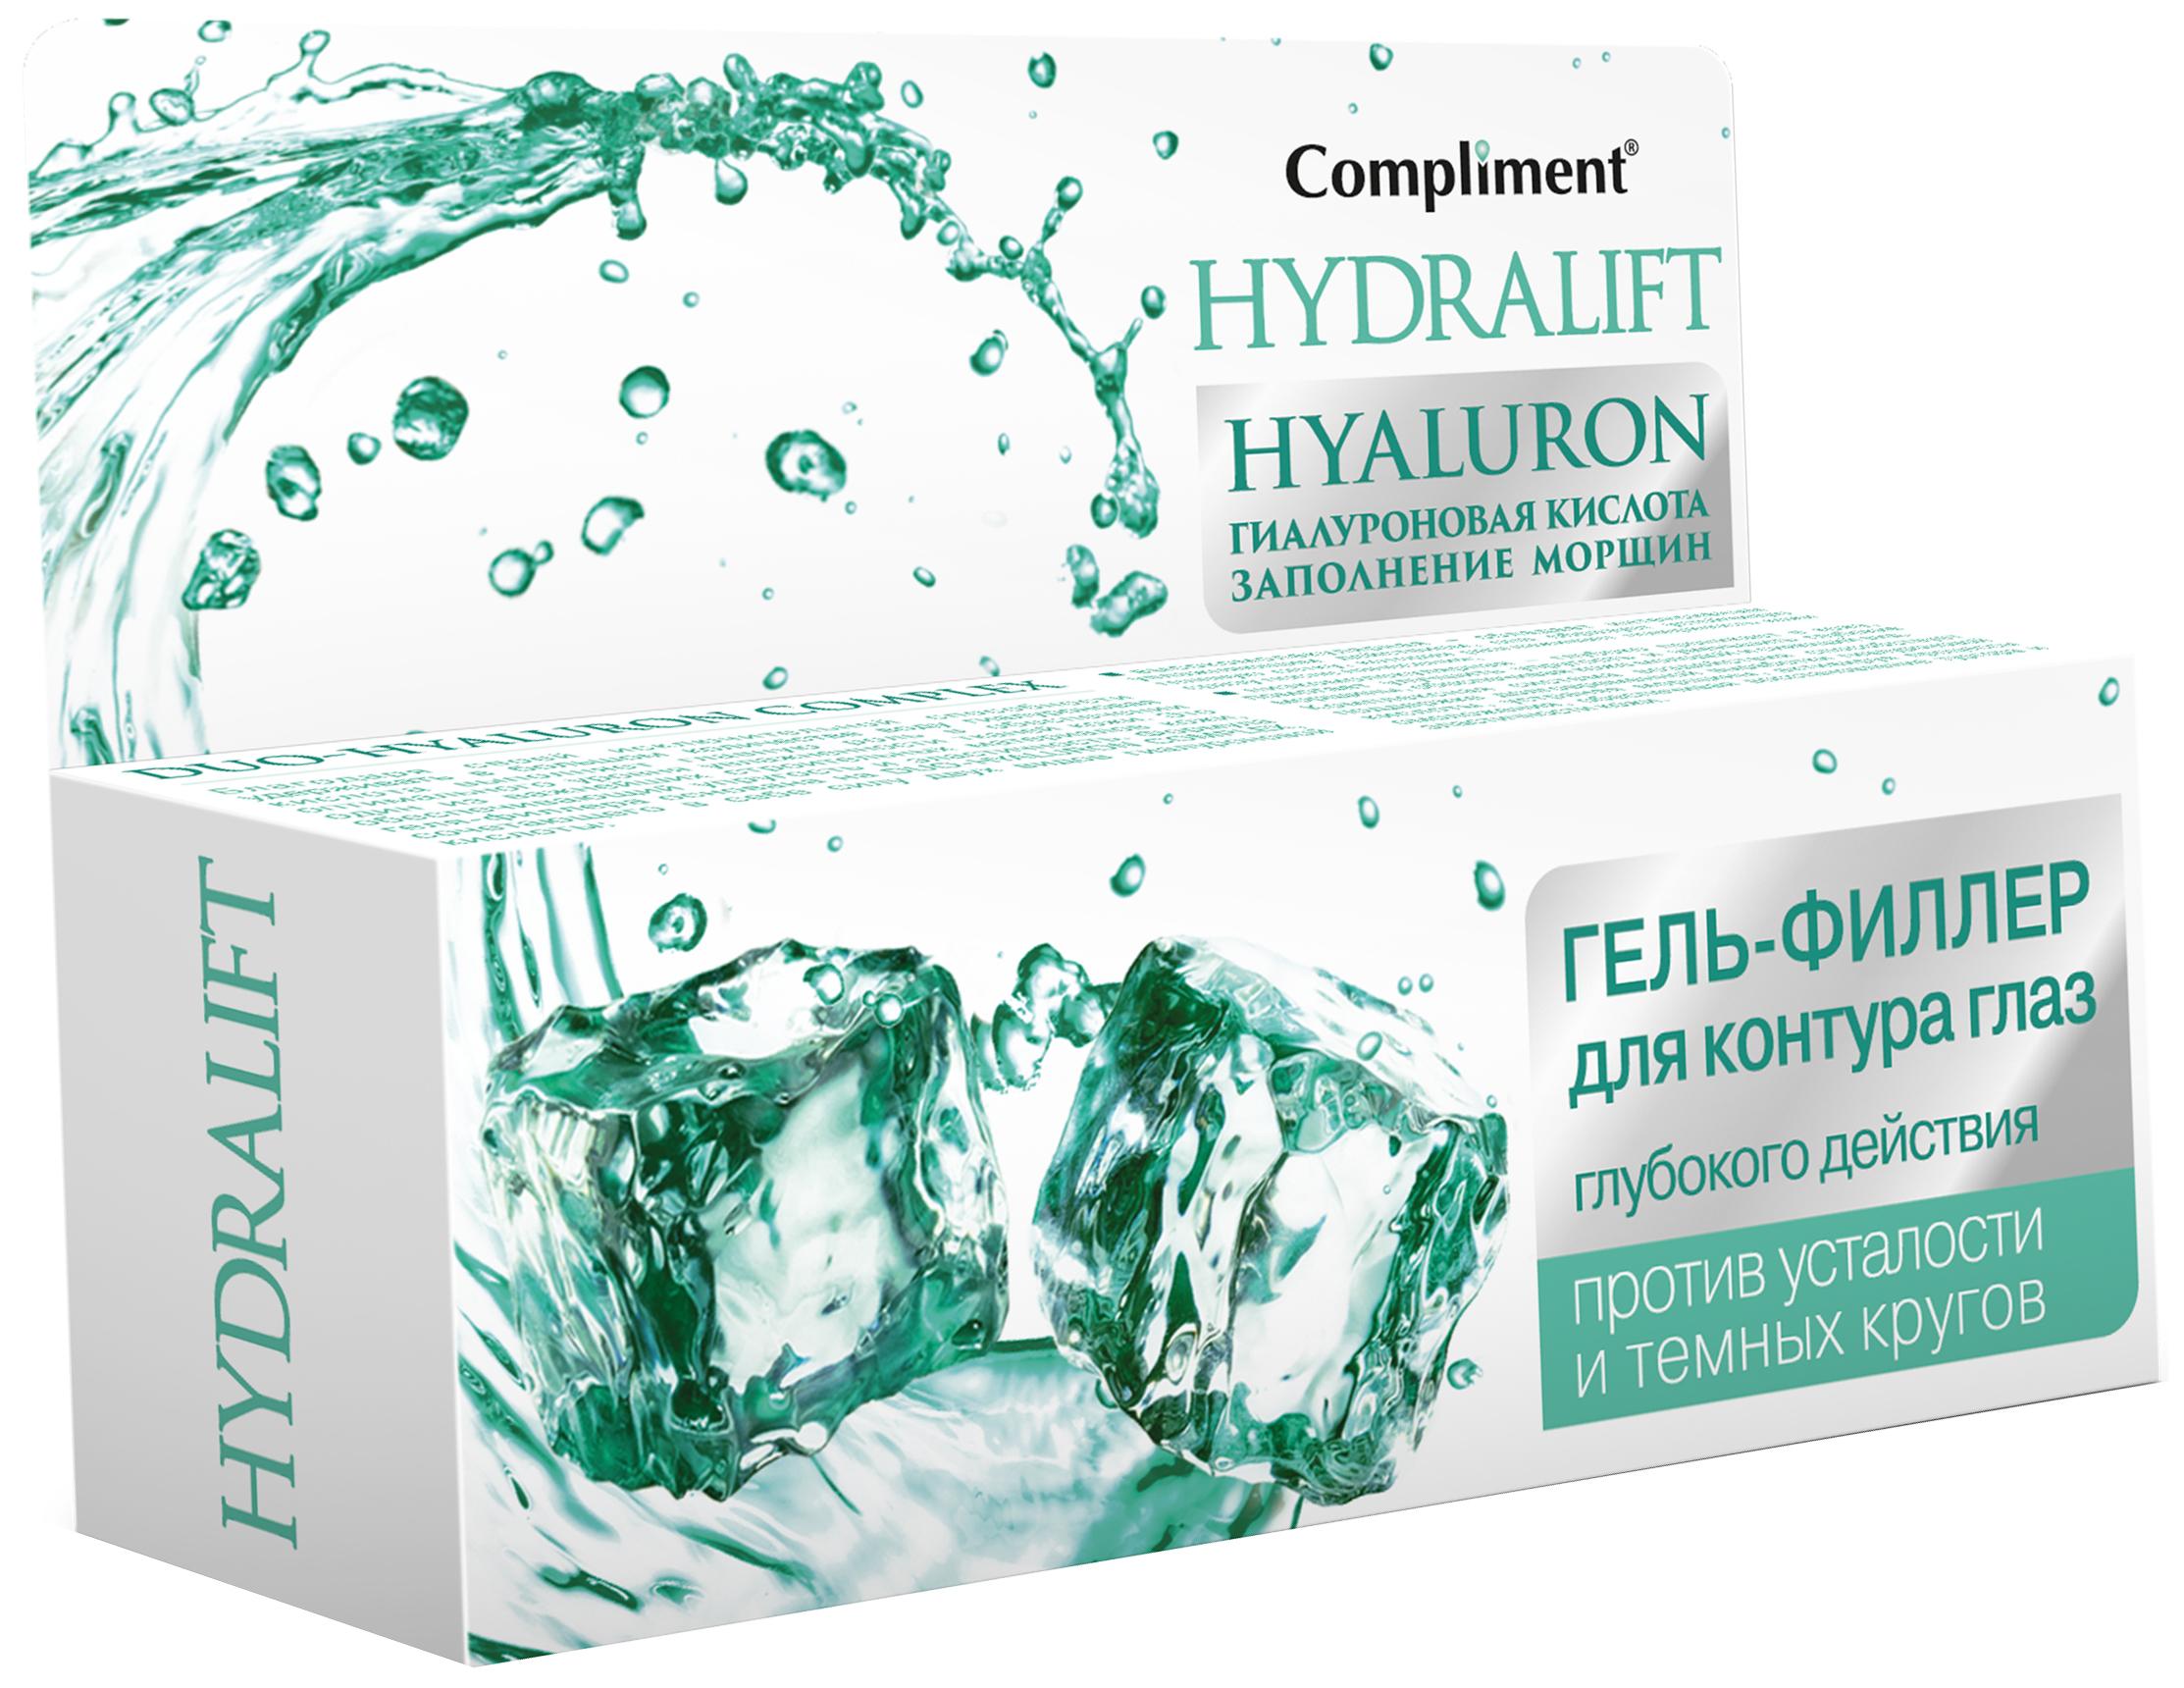 Гель-филлер Compliment Hydralift Hyaluron глубокого действия 25 мл